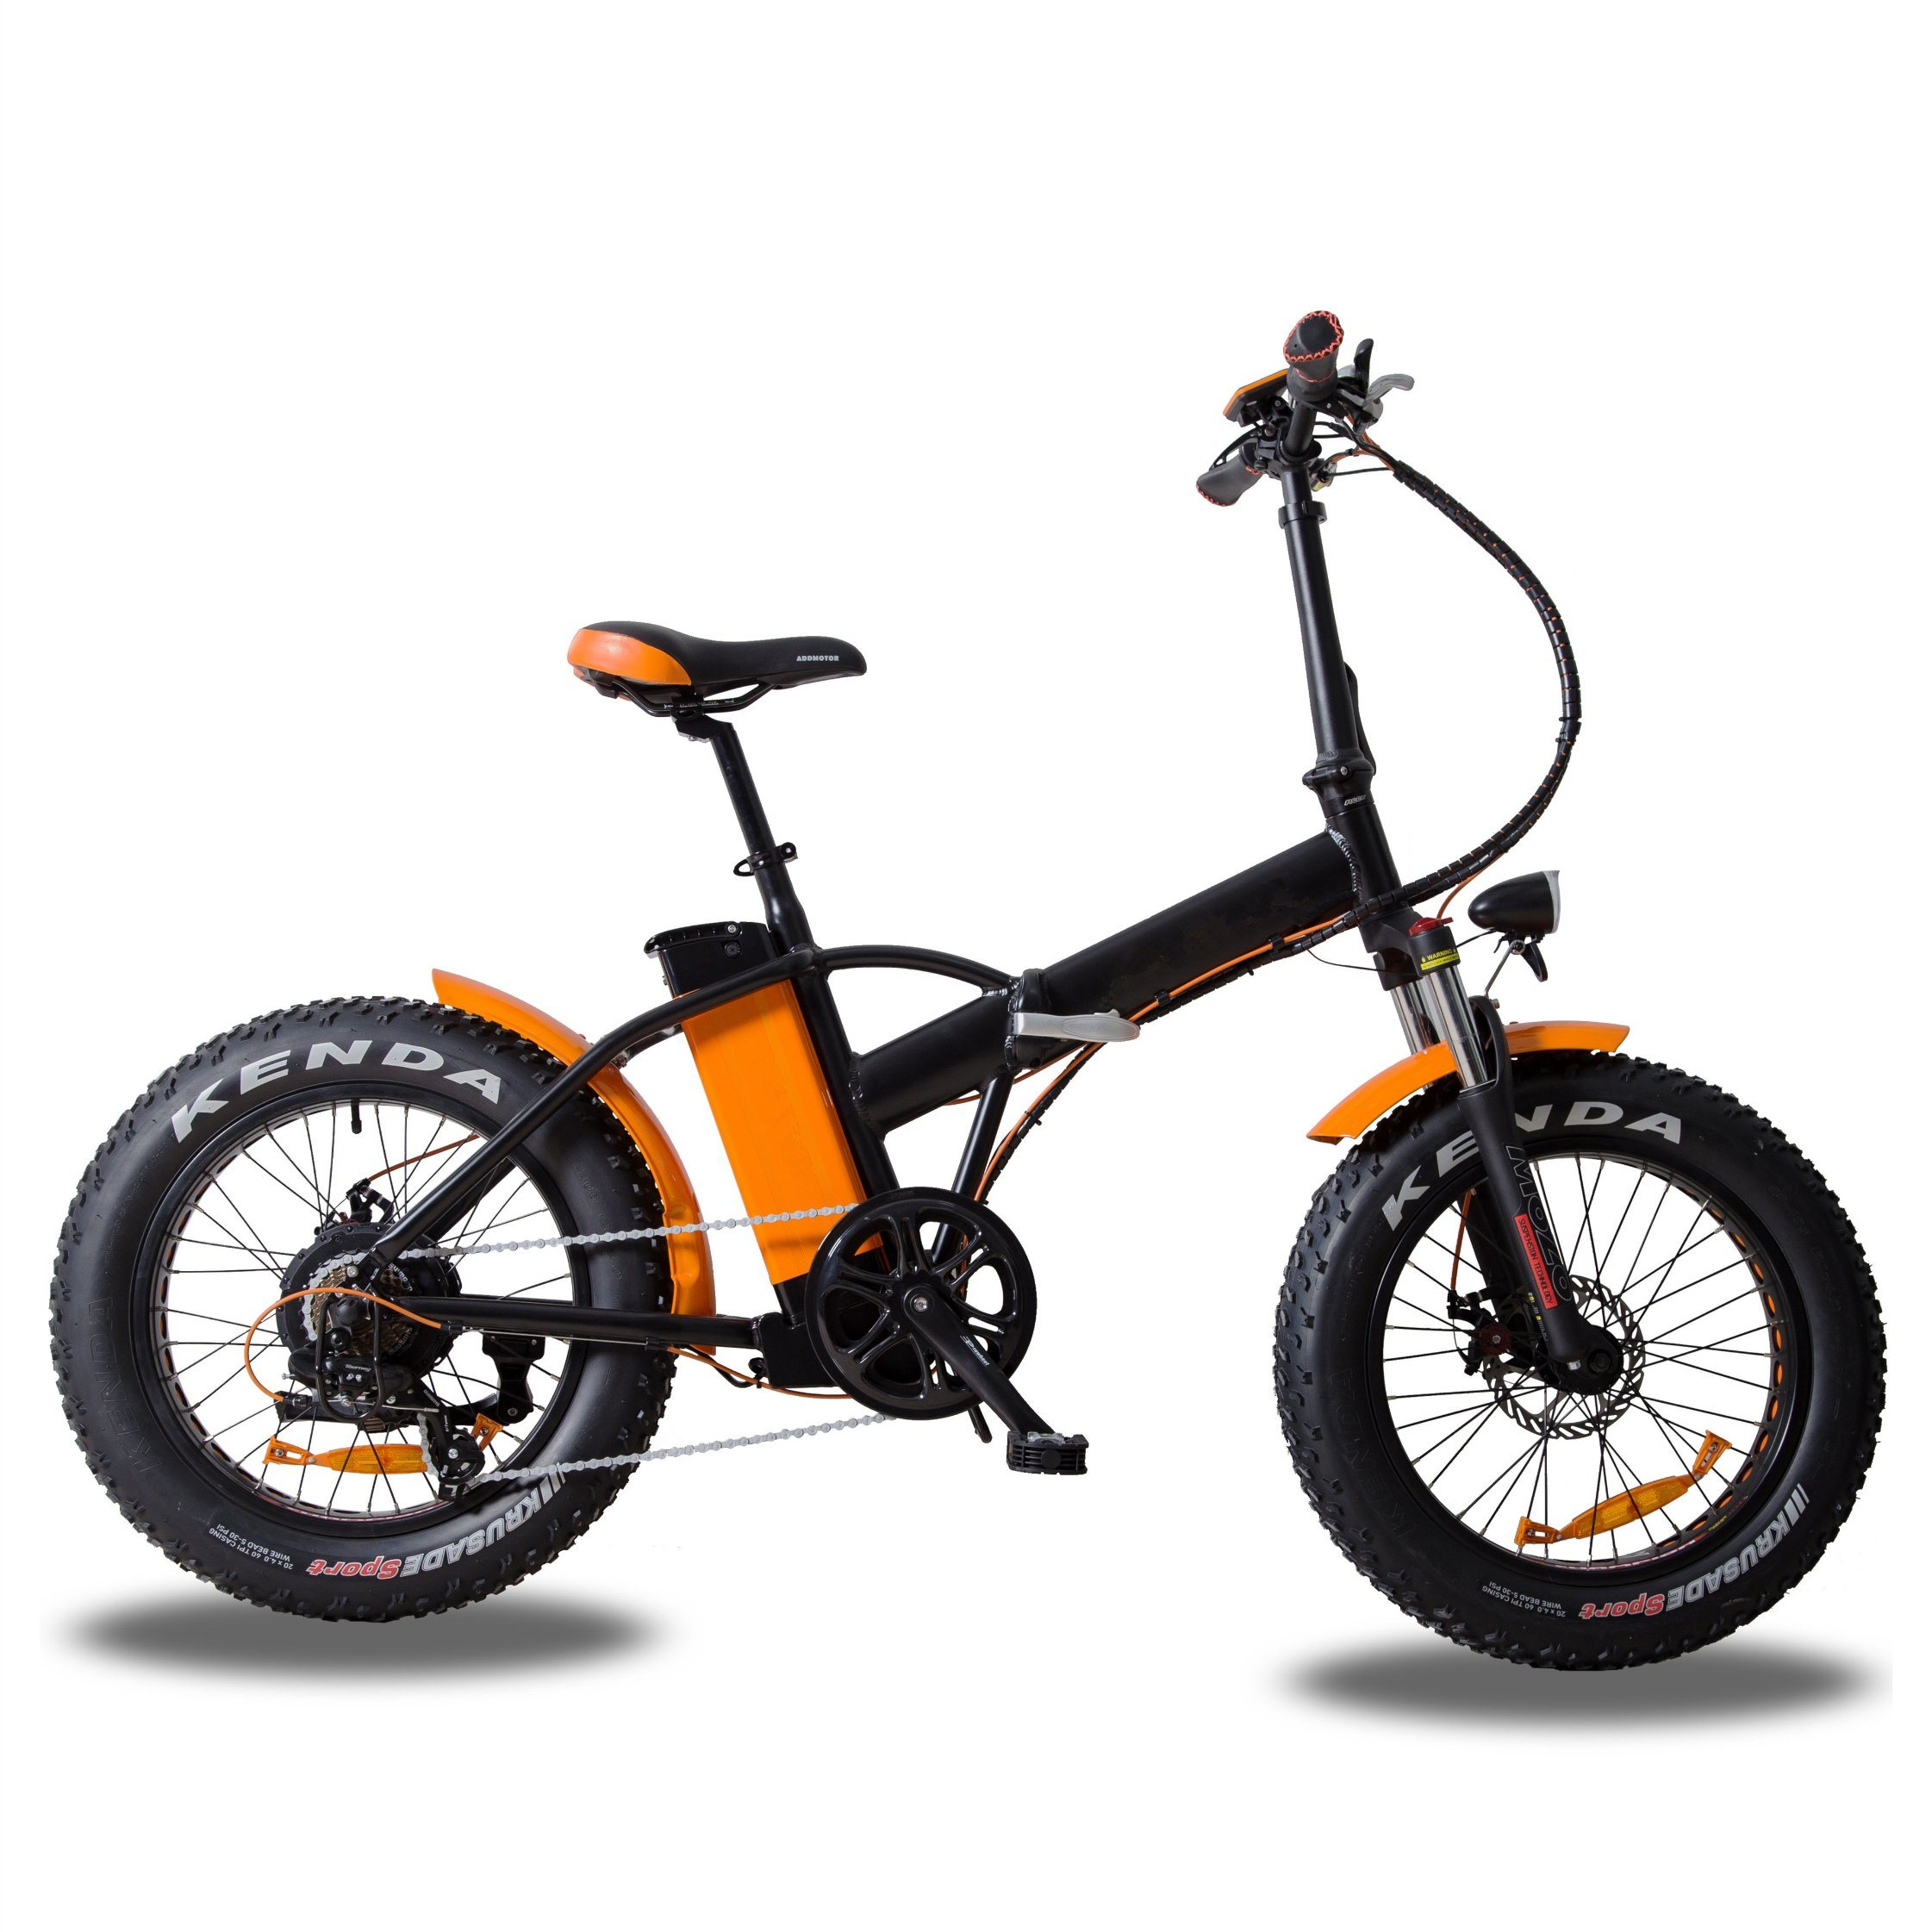 45536ca6cab China 20′′ Folding Electric Bicycle Fat Bike with Bafang Motor - China  Bike, Electric Bike